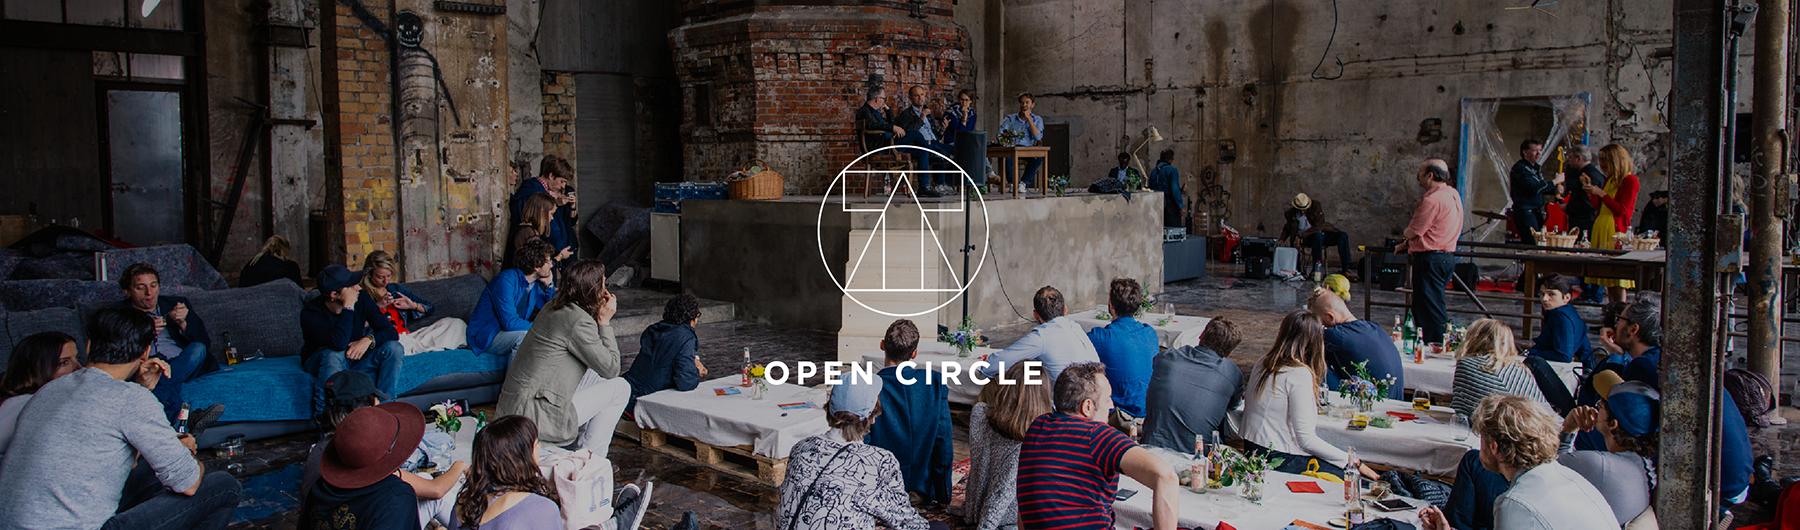 Open Circle 2018